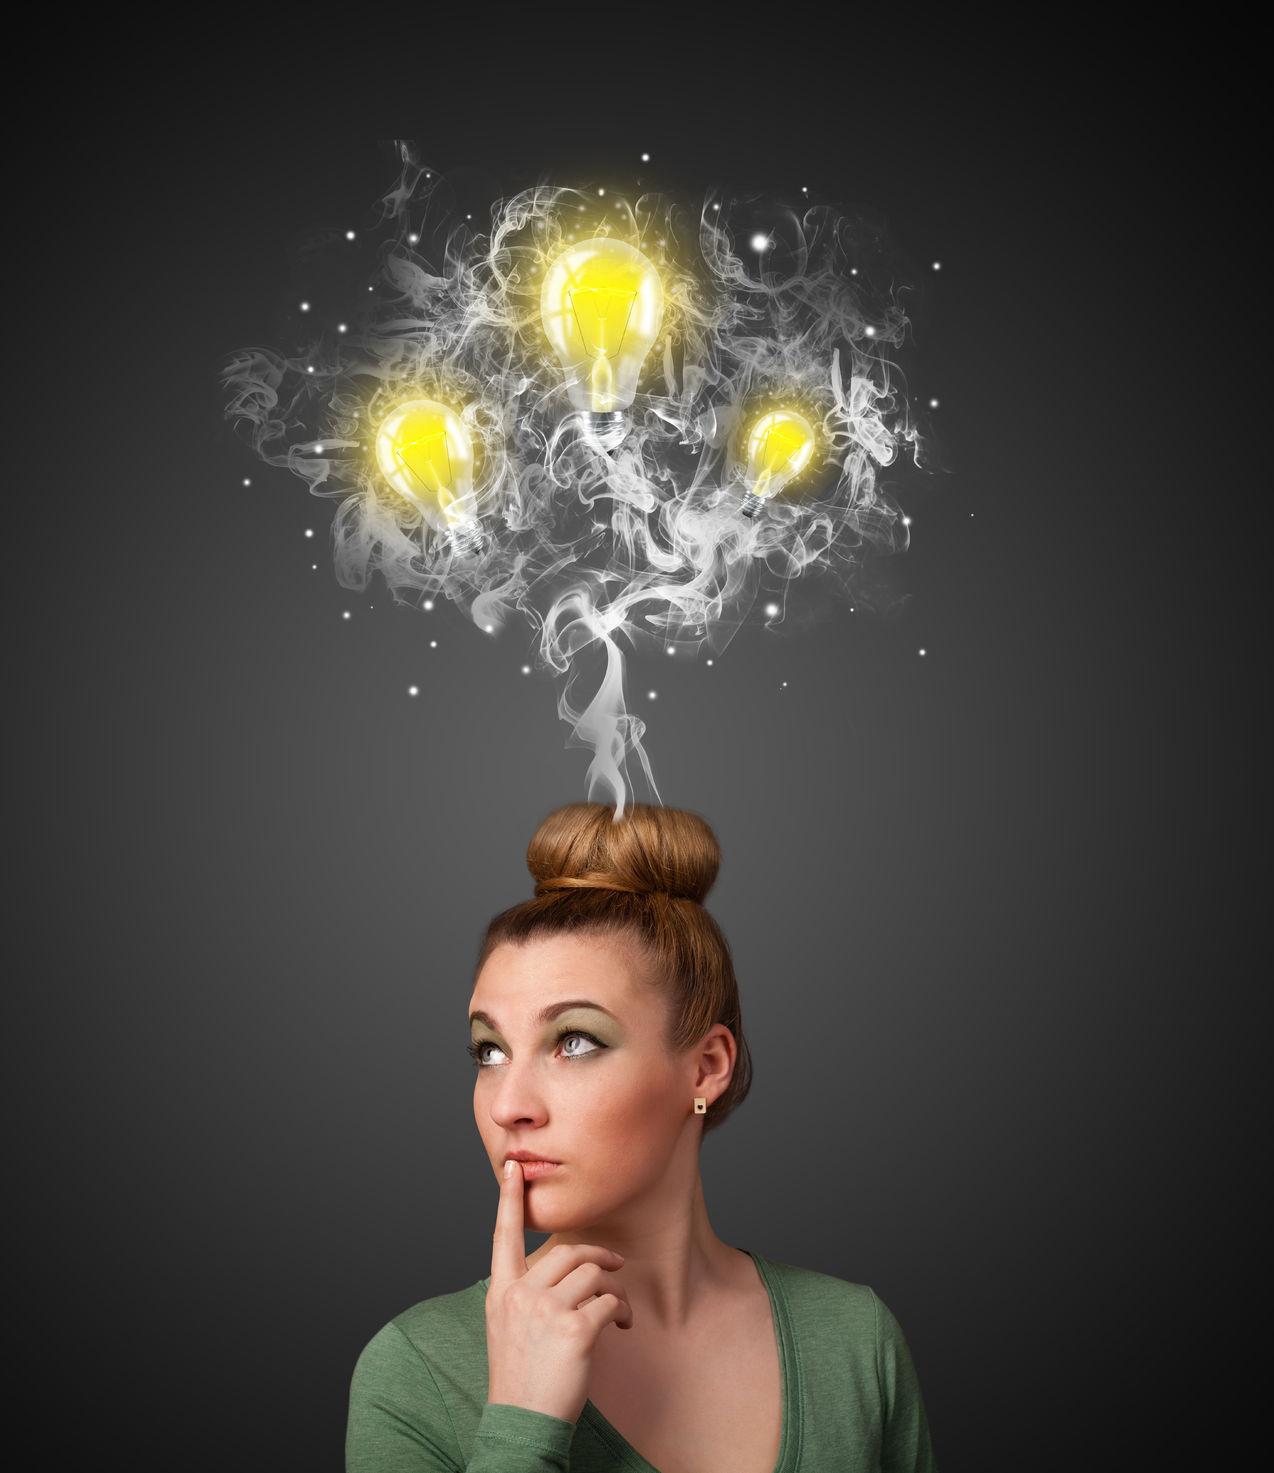 lightbulbs-over-woman